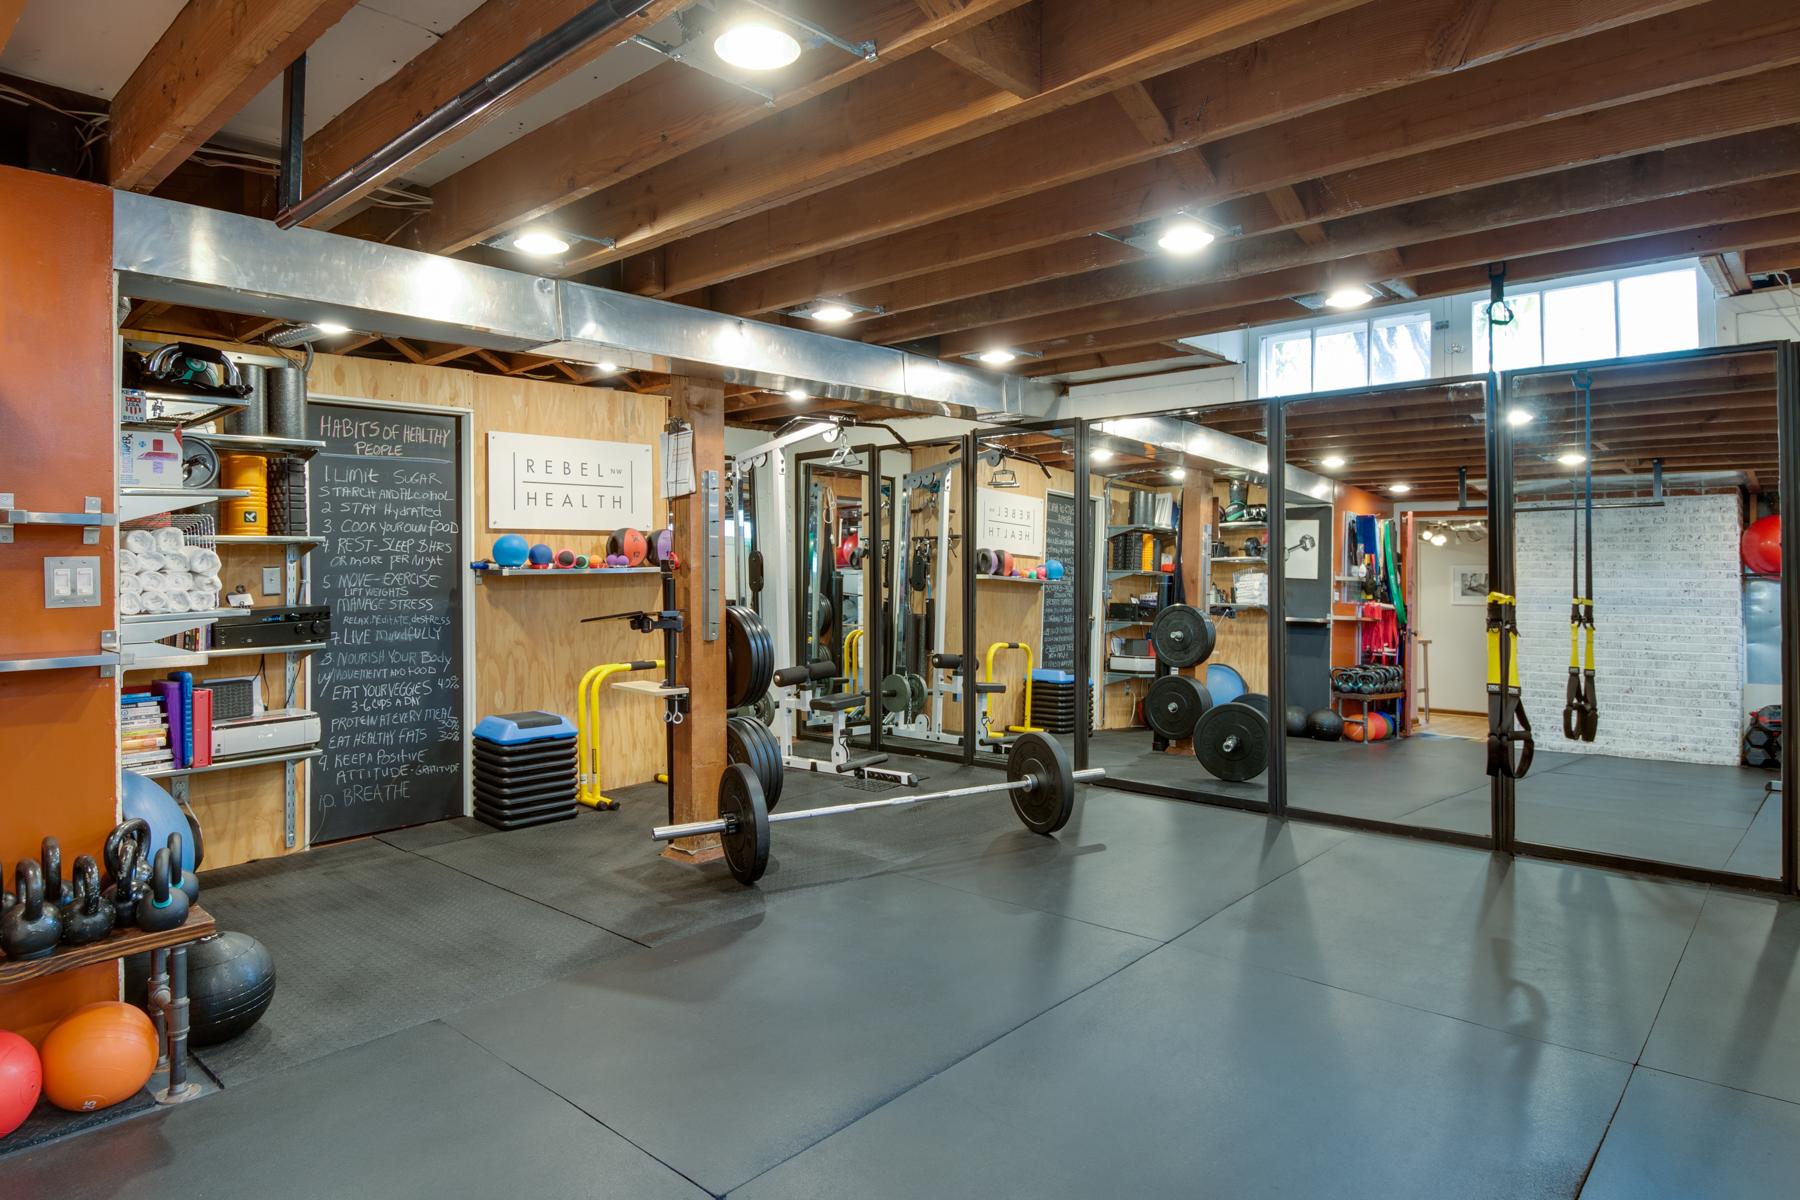 Rebel-Health-NW-Personal-Training-Gym